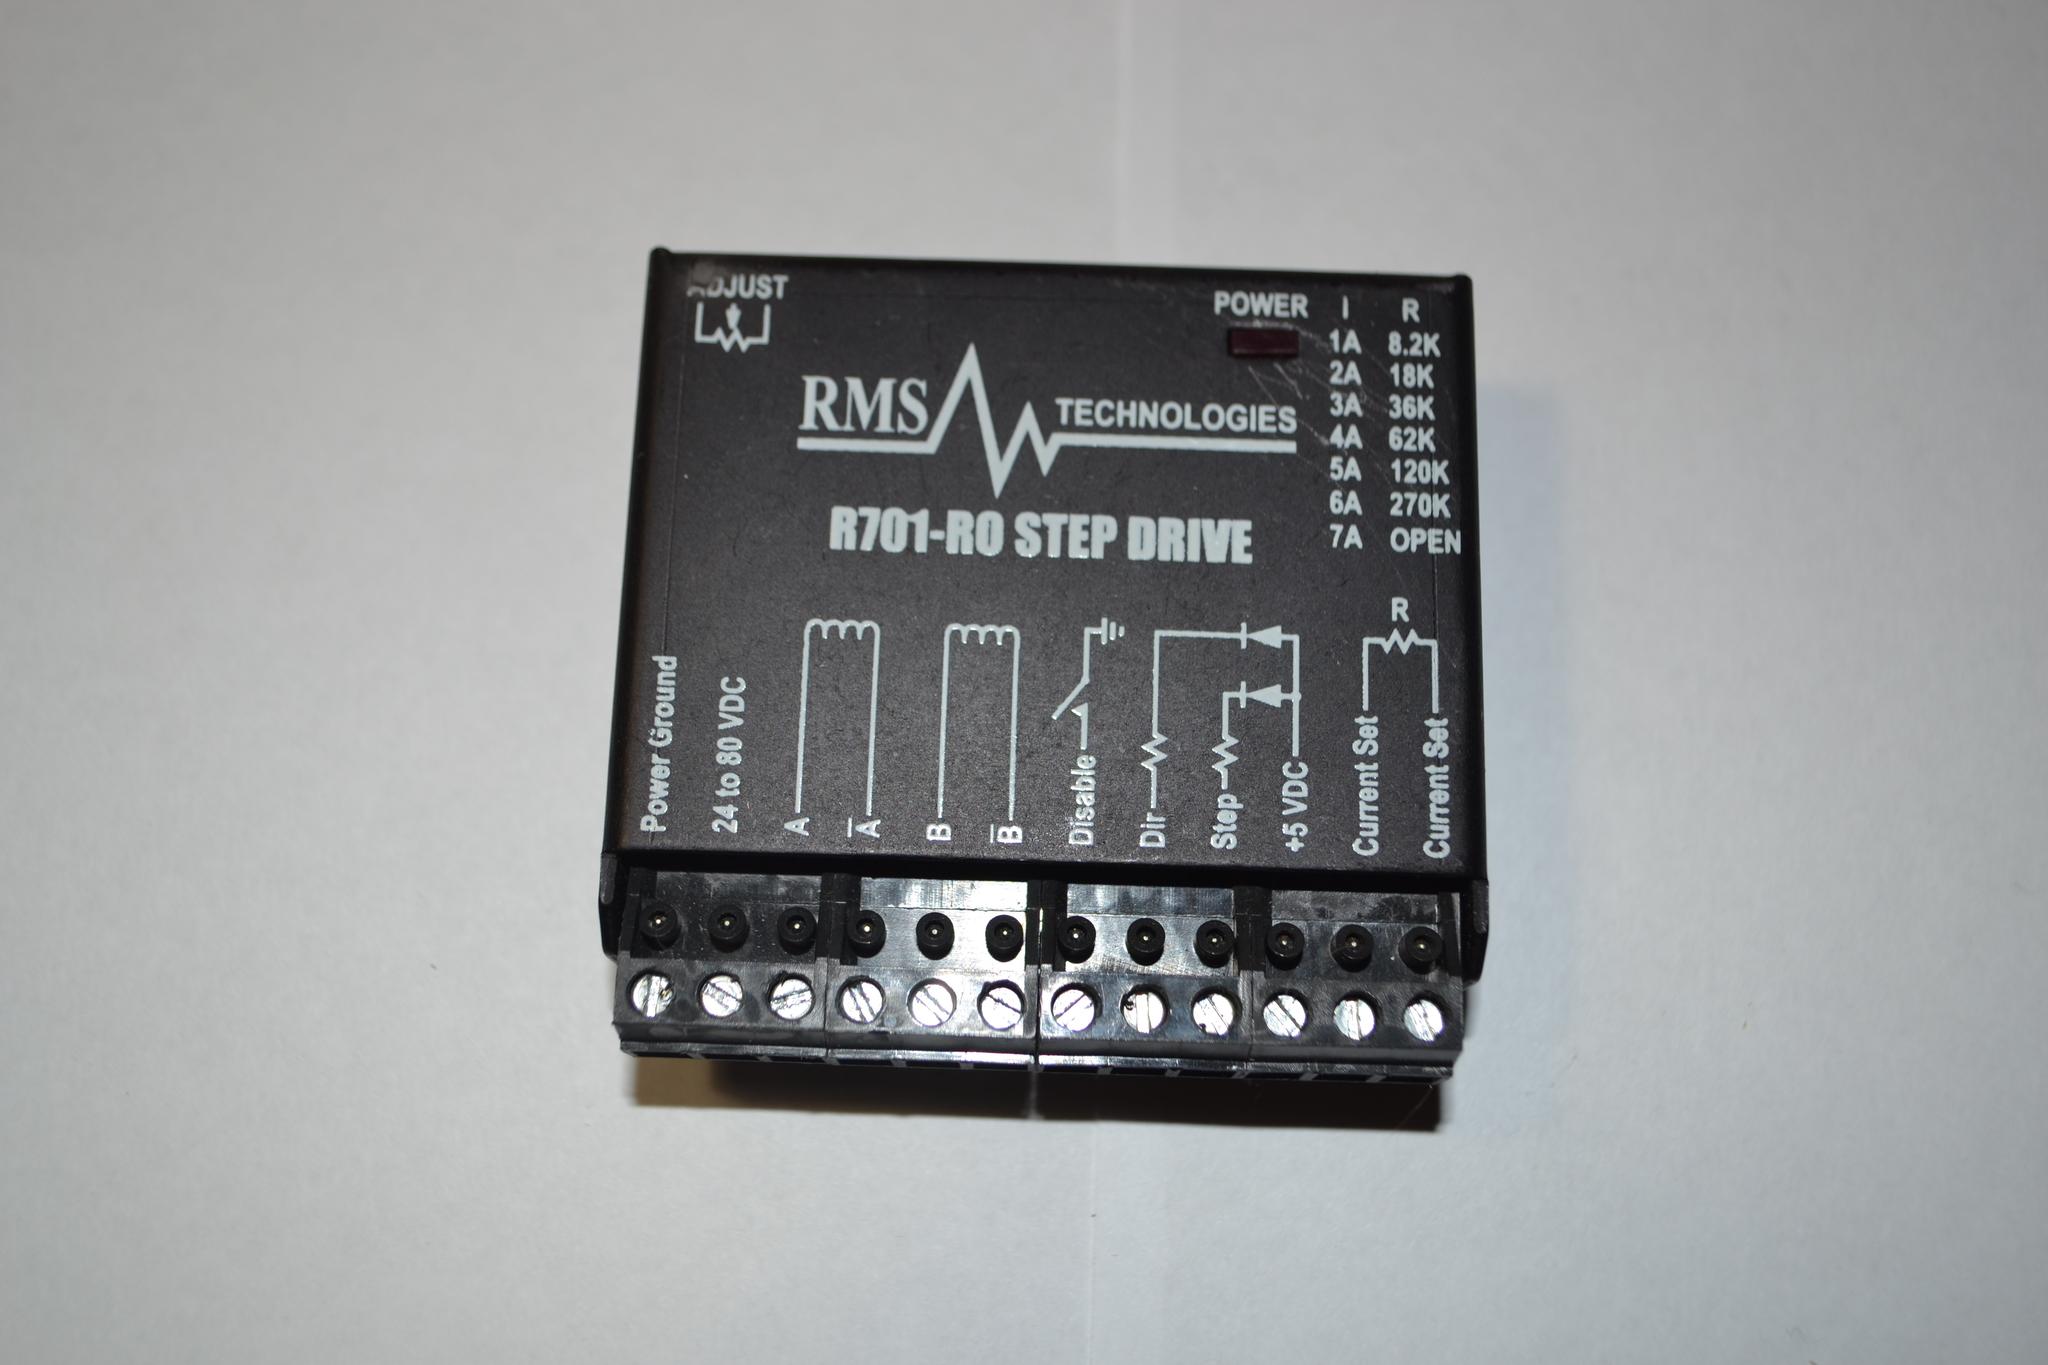 Драйвер R701-RO step drive Videojet 210 Willett